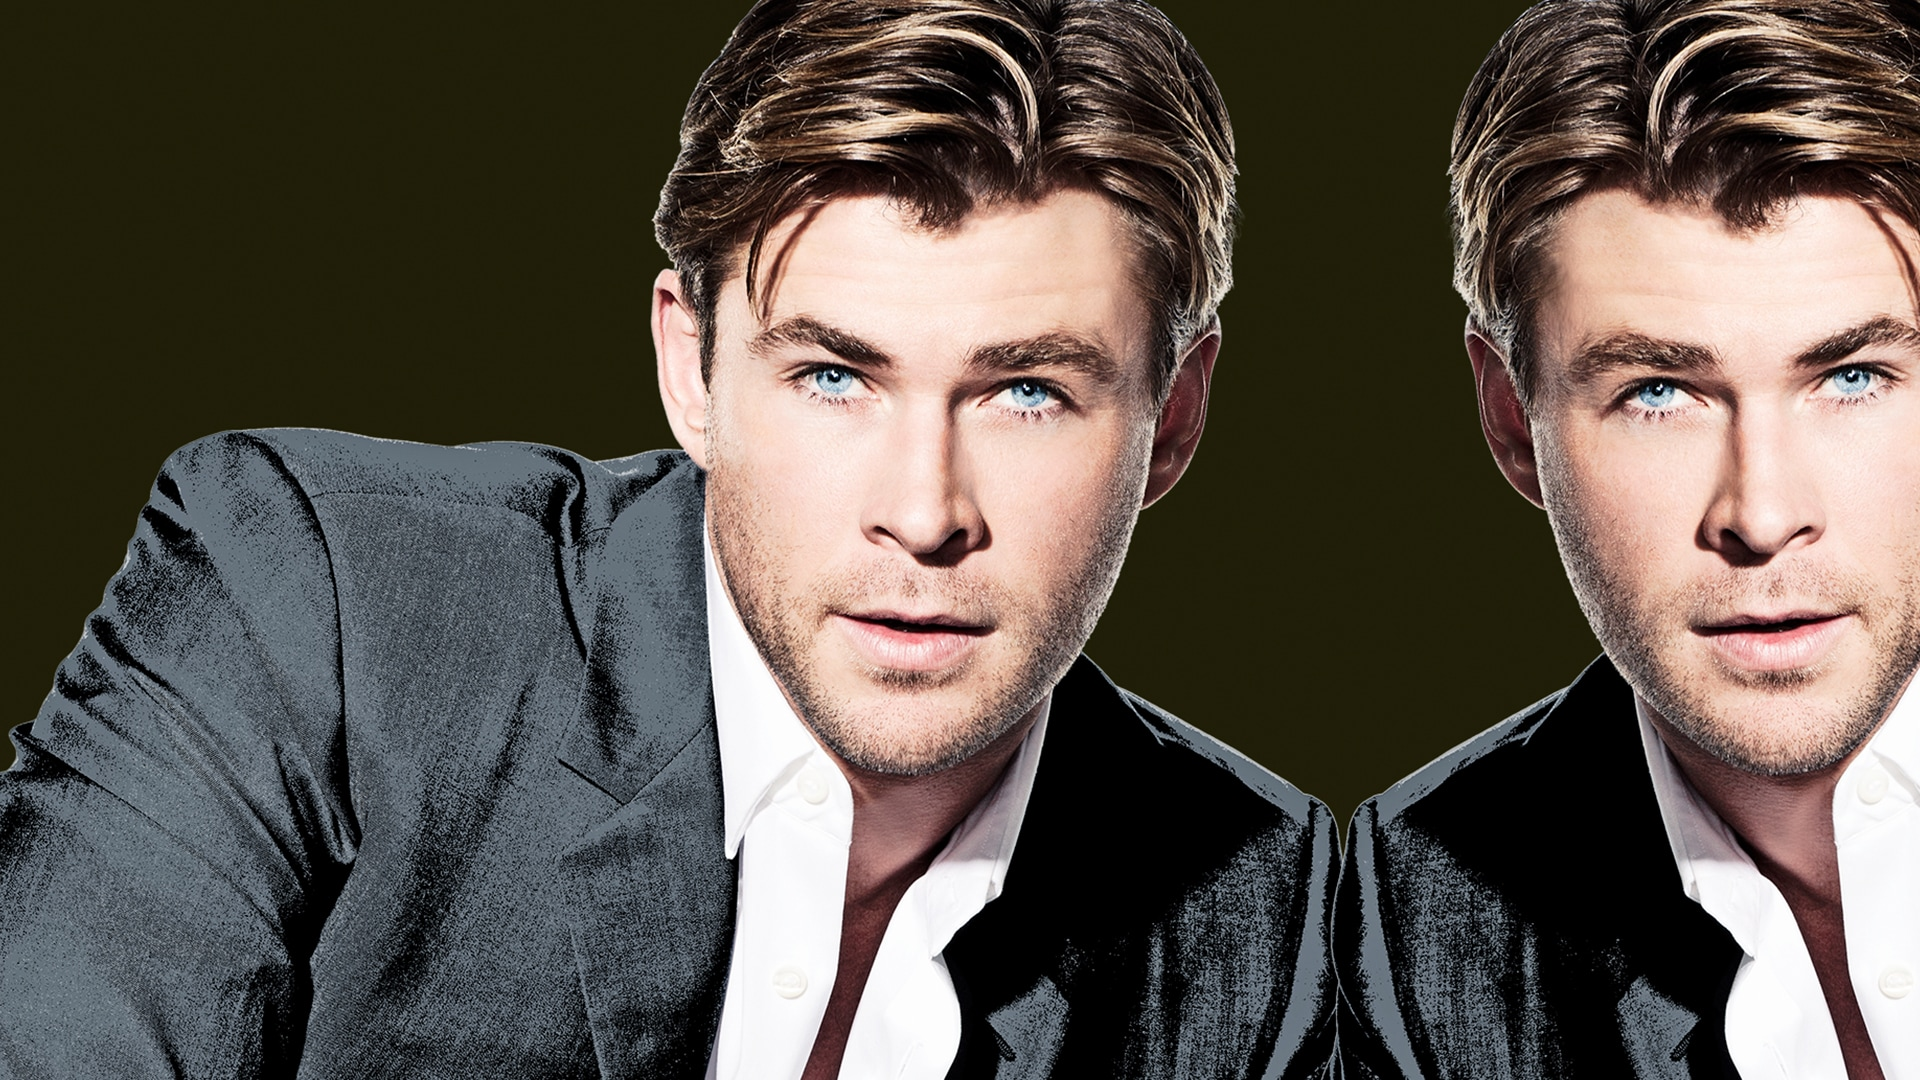 Chris Hemsworth: December 12, 2015